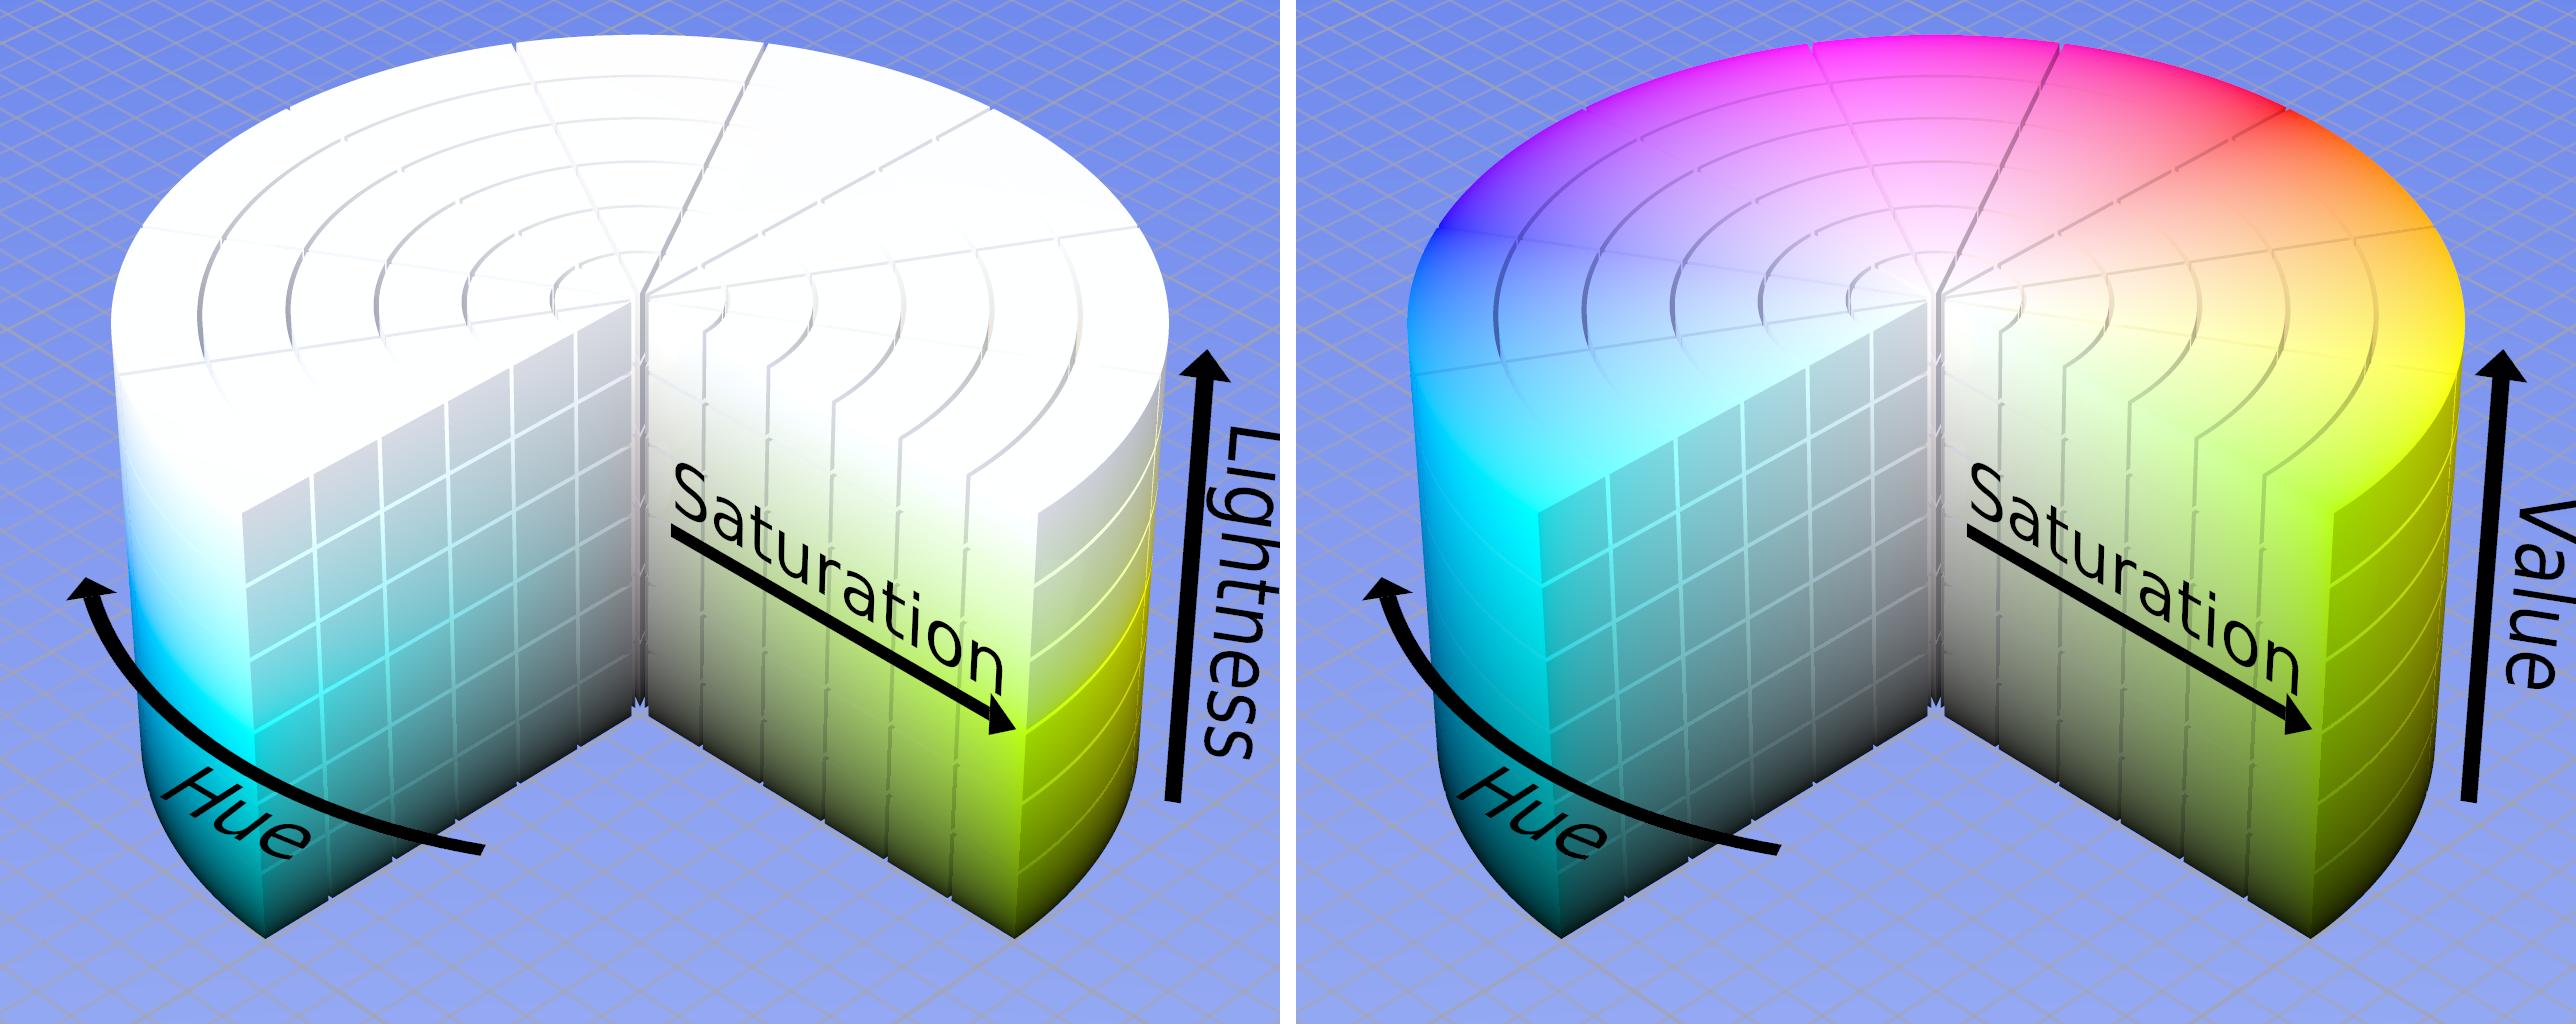 Hsb or hsv a digital color mode the h stands for hue the s for hsb or hsv a digital color mode the h stands for hue the s geenschuldenfo Choice Image